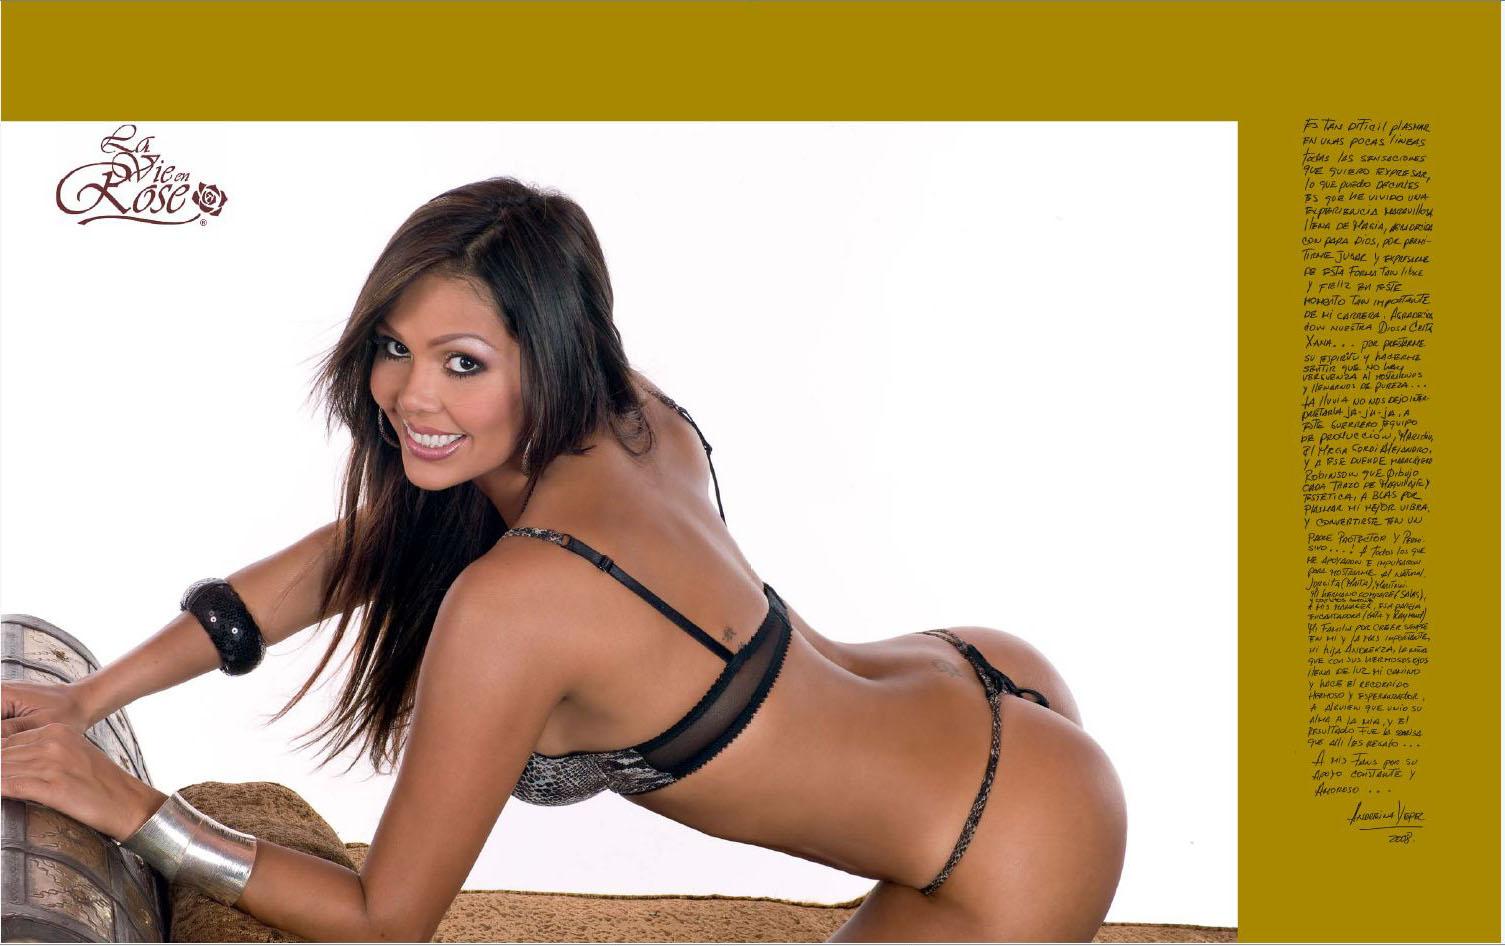 Christina Playboy